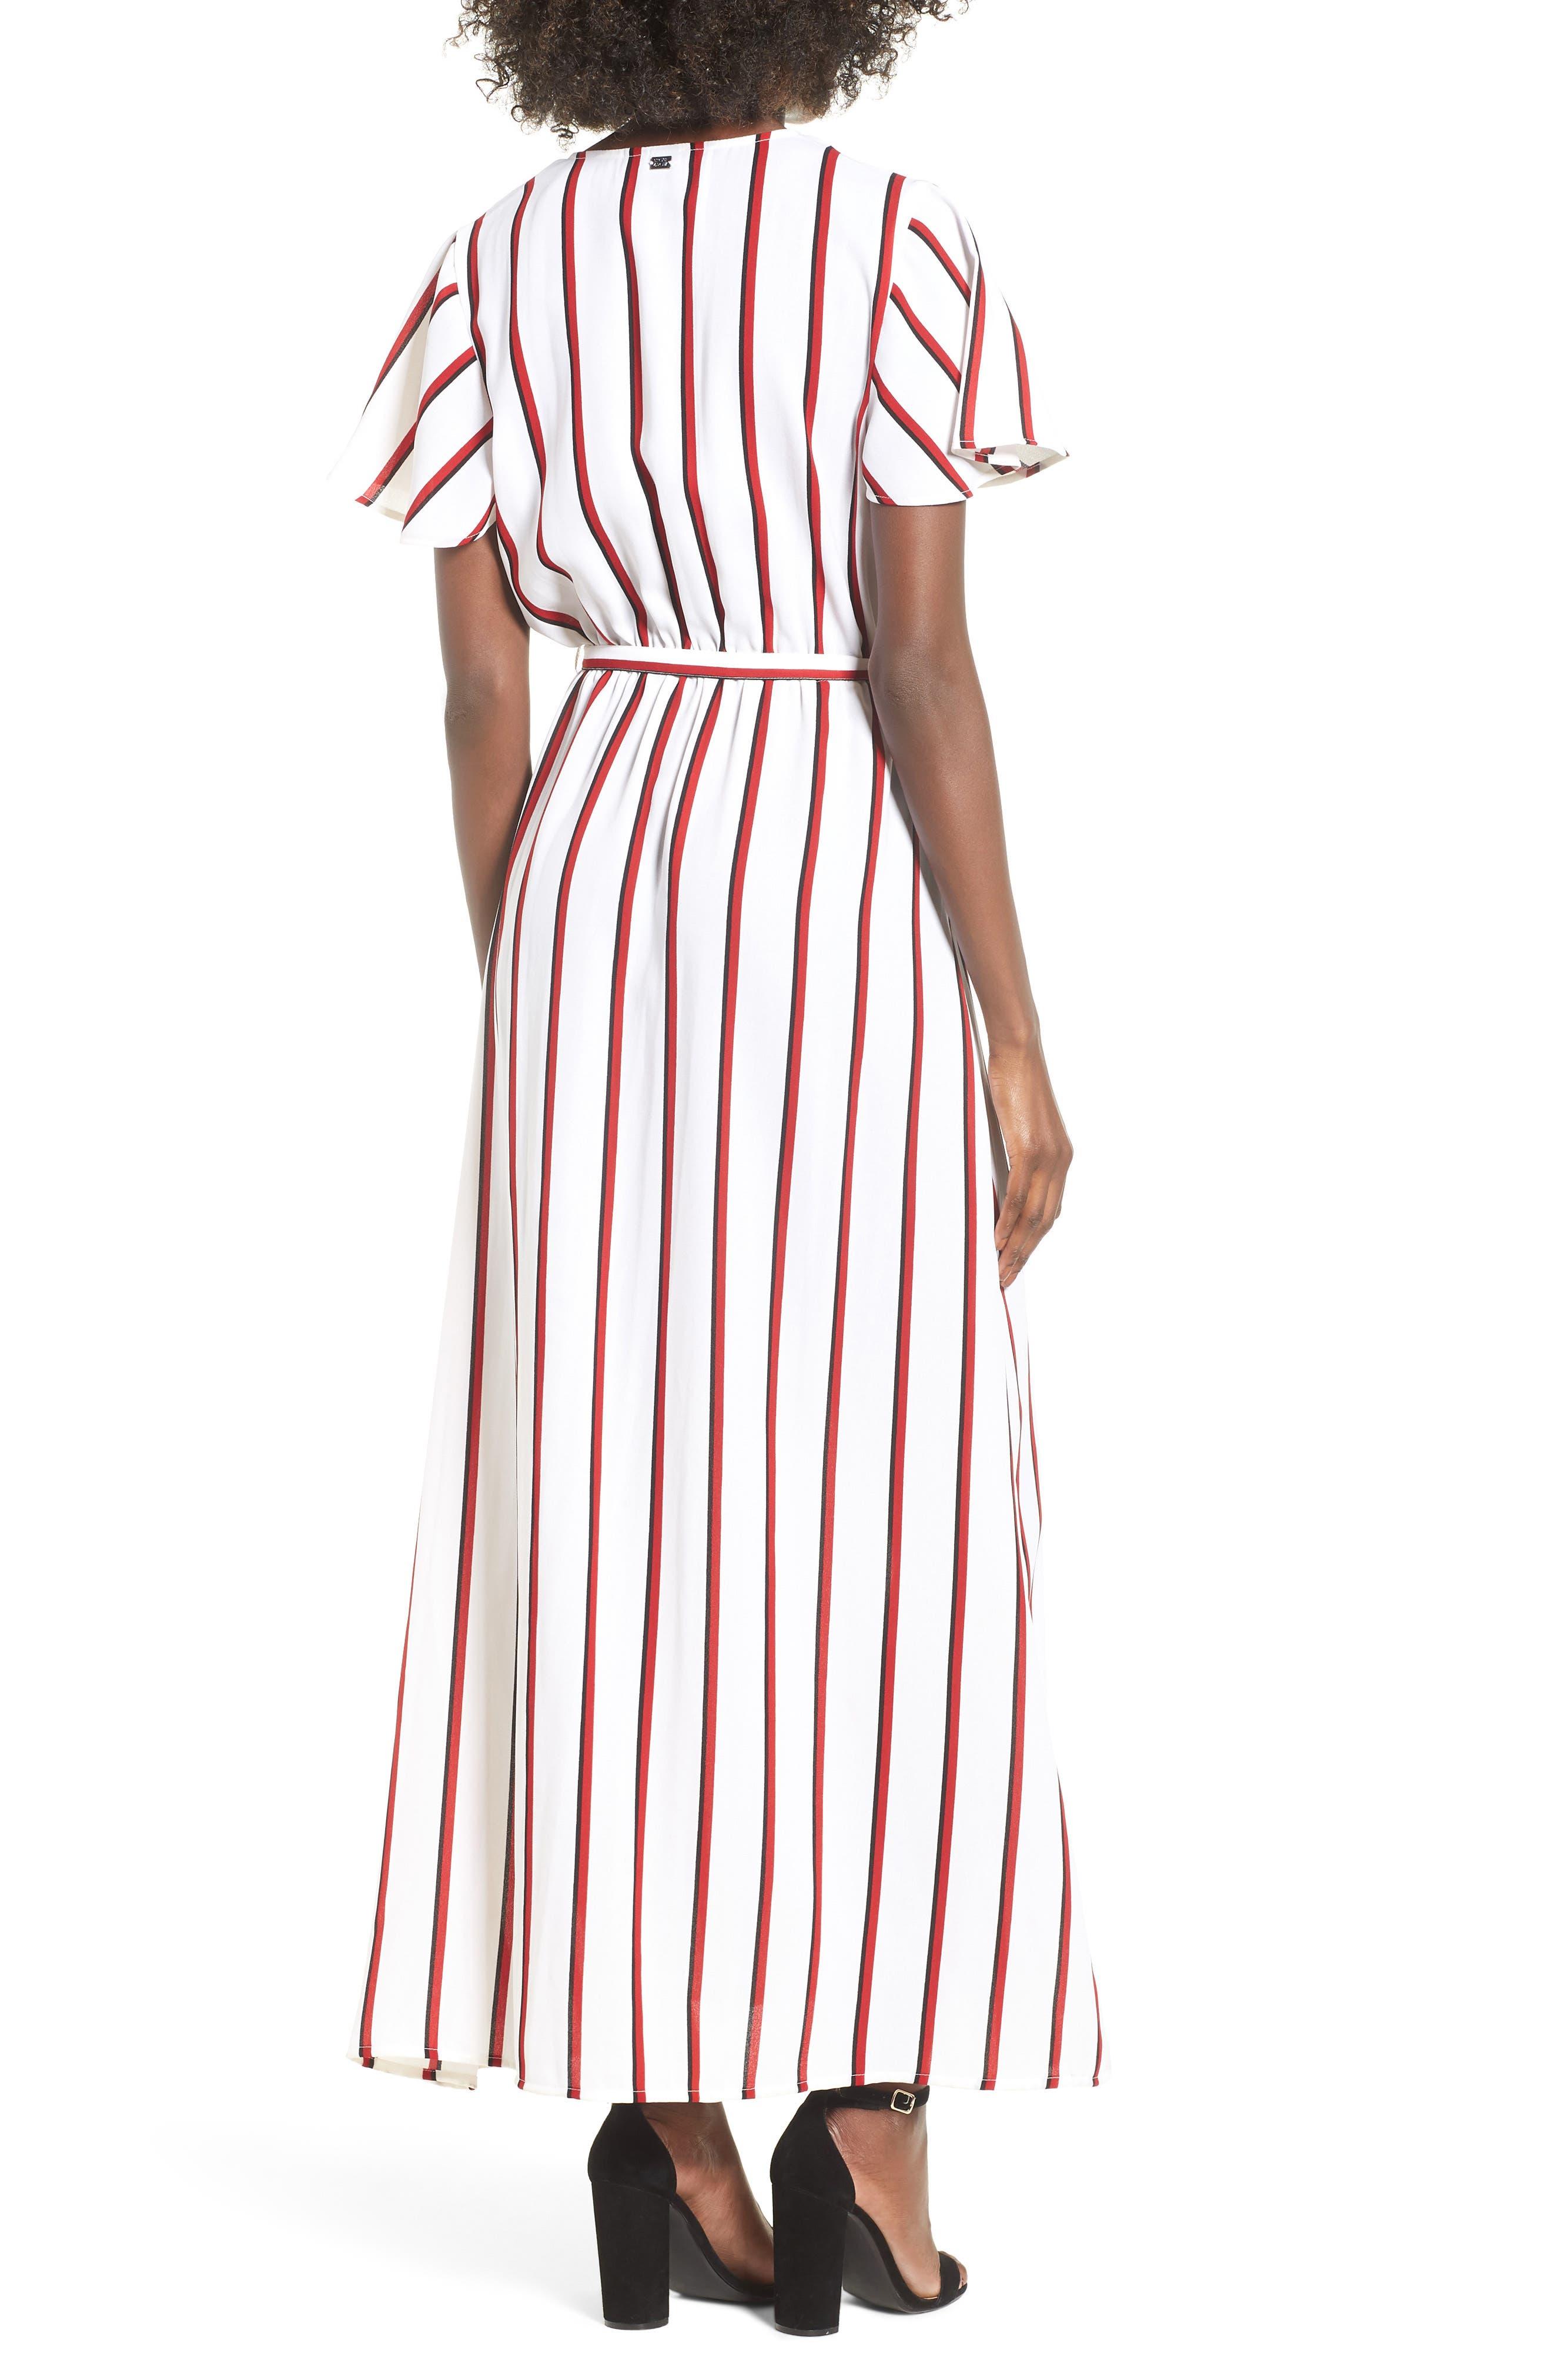 EZ Days Satin Wrap Maxi Dress,                             Alternate thumbnail 2, color,                             Chili Red